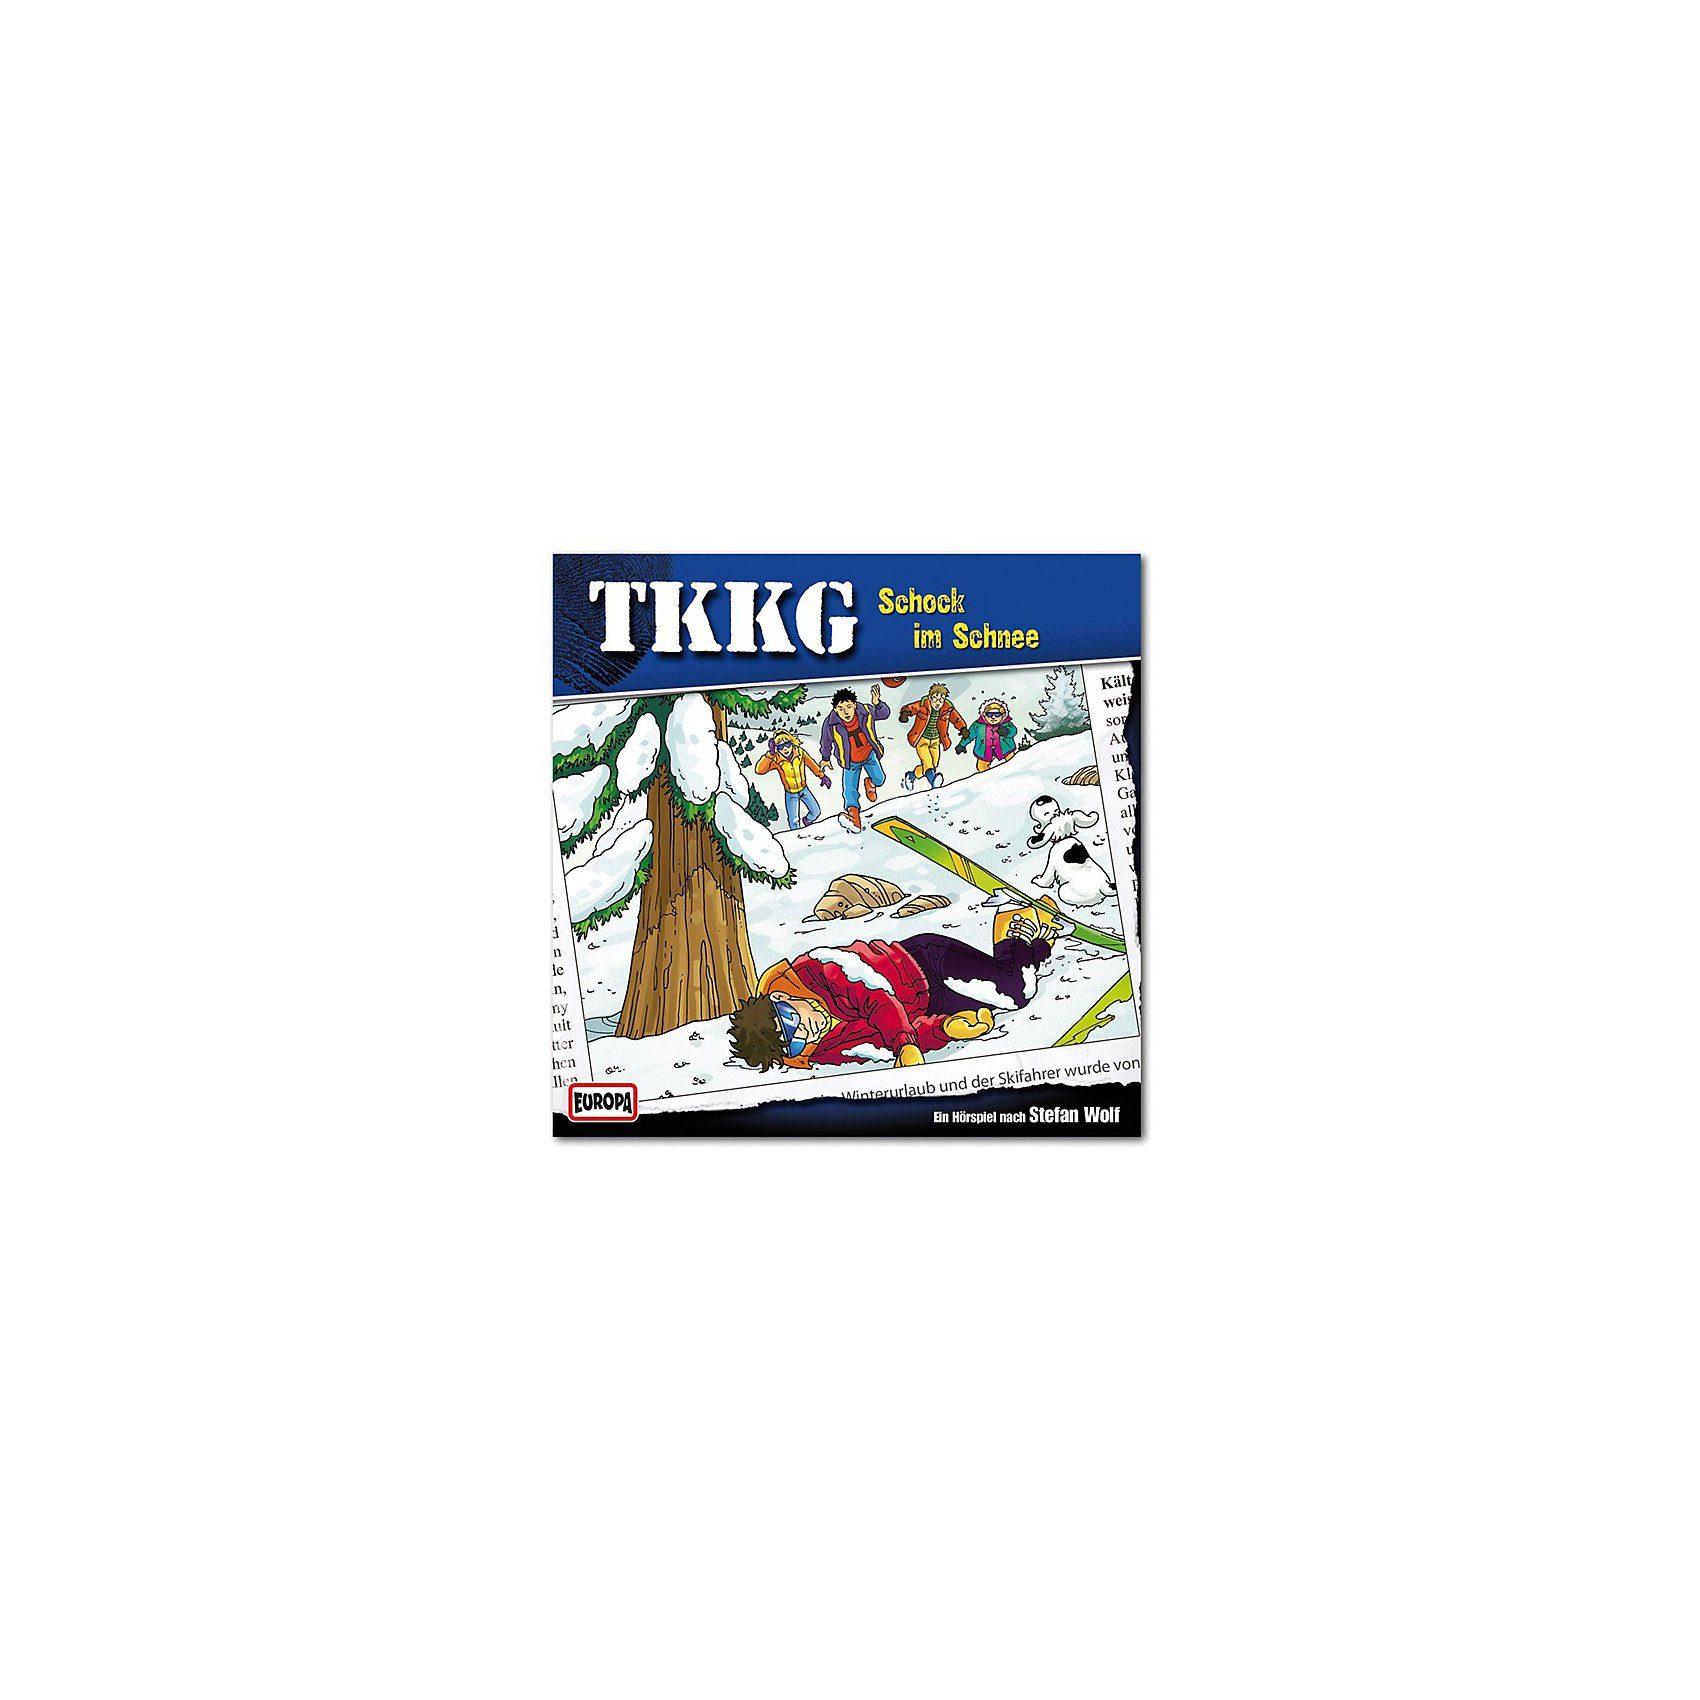 Sony CD TKKG 170 - Schock im Schnee